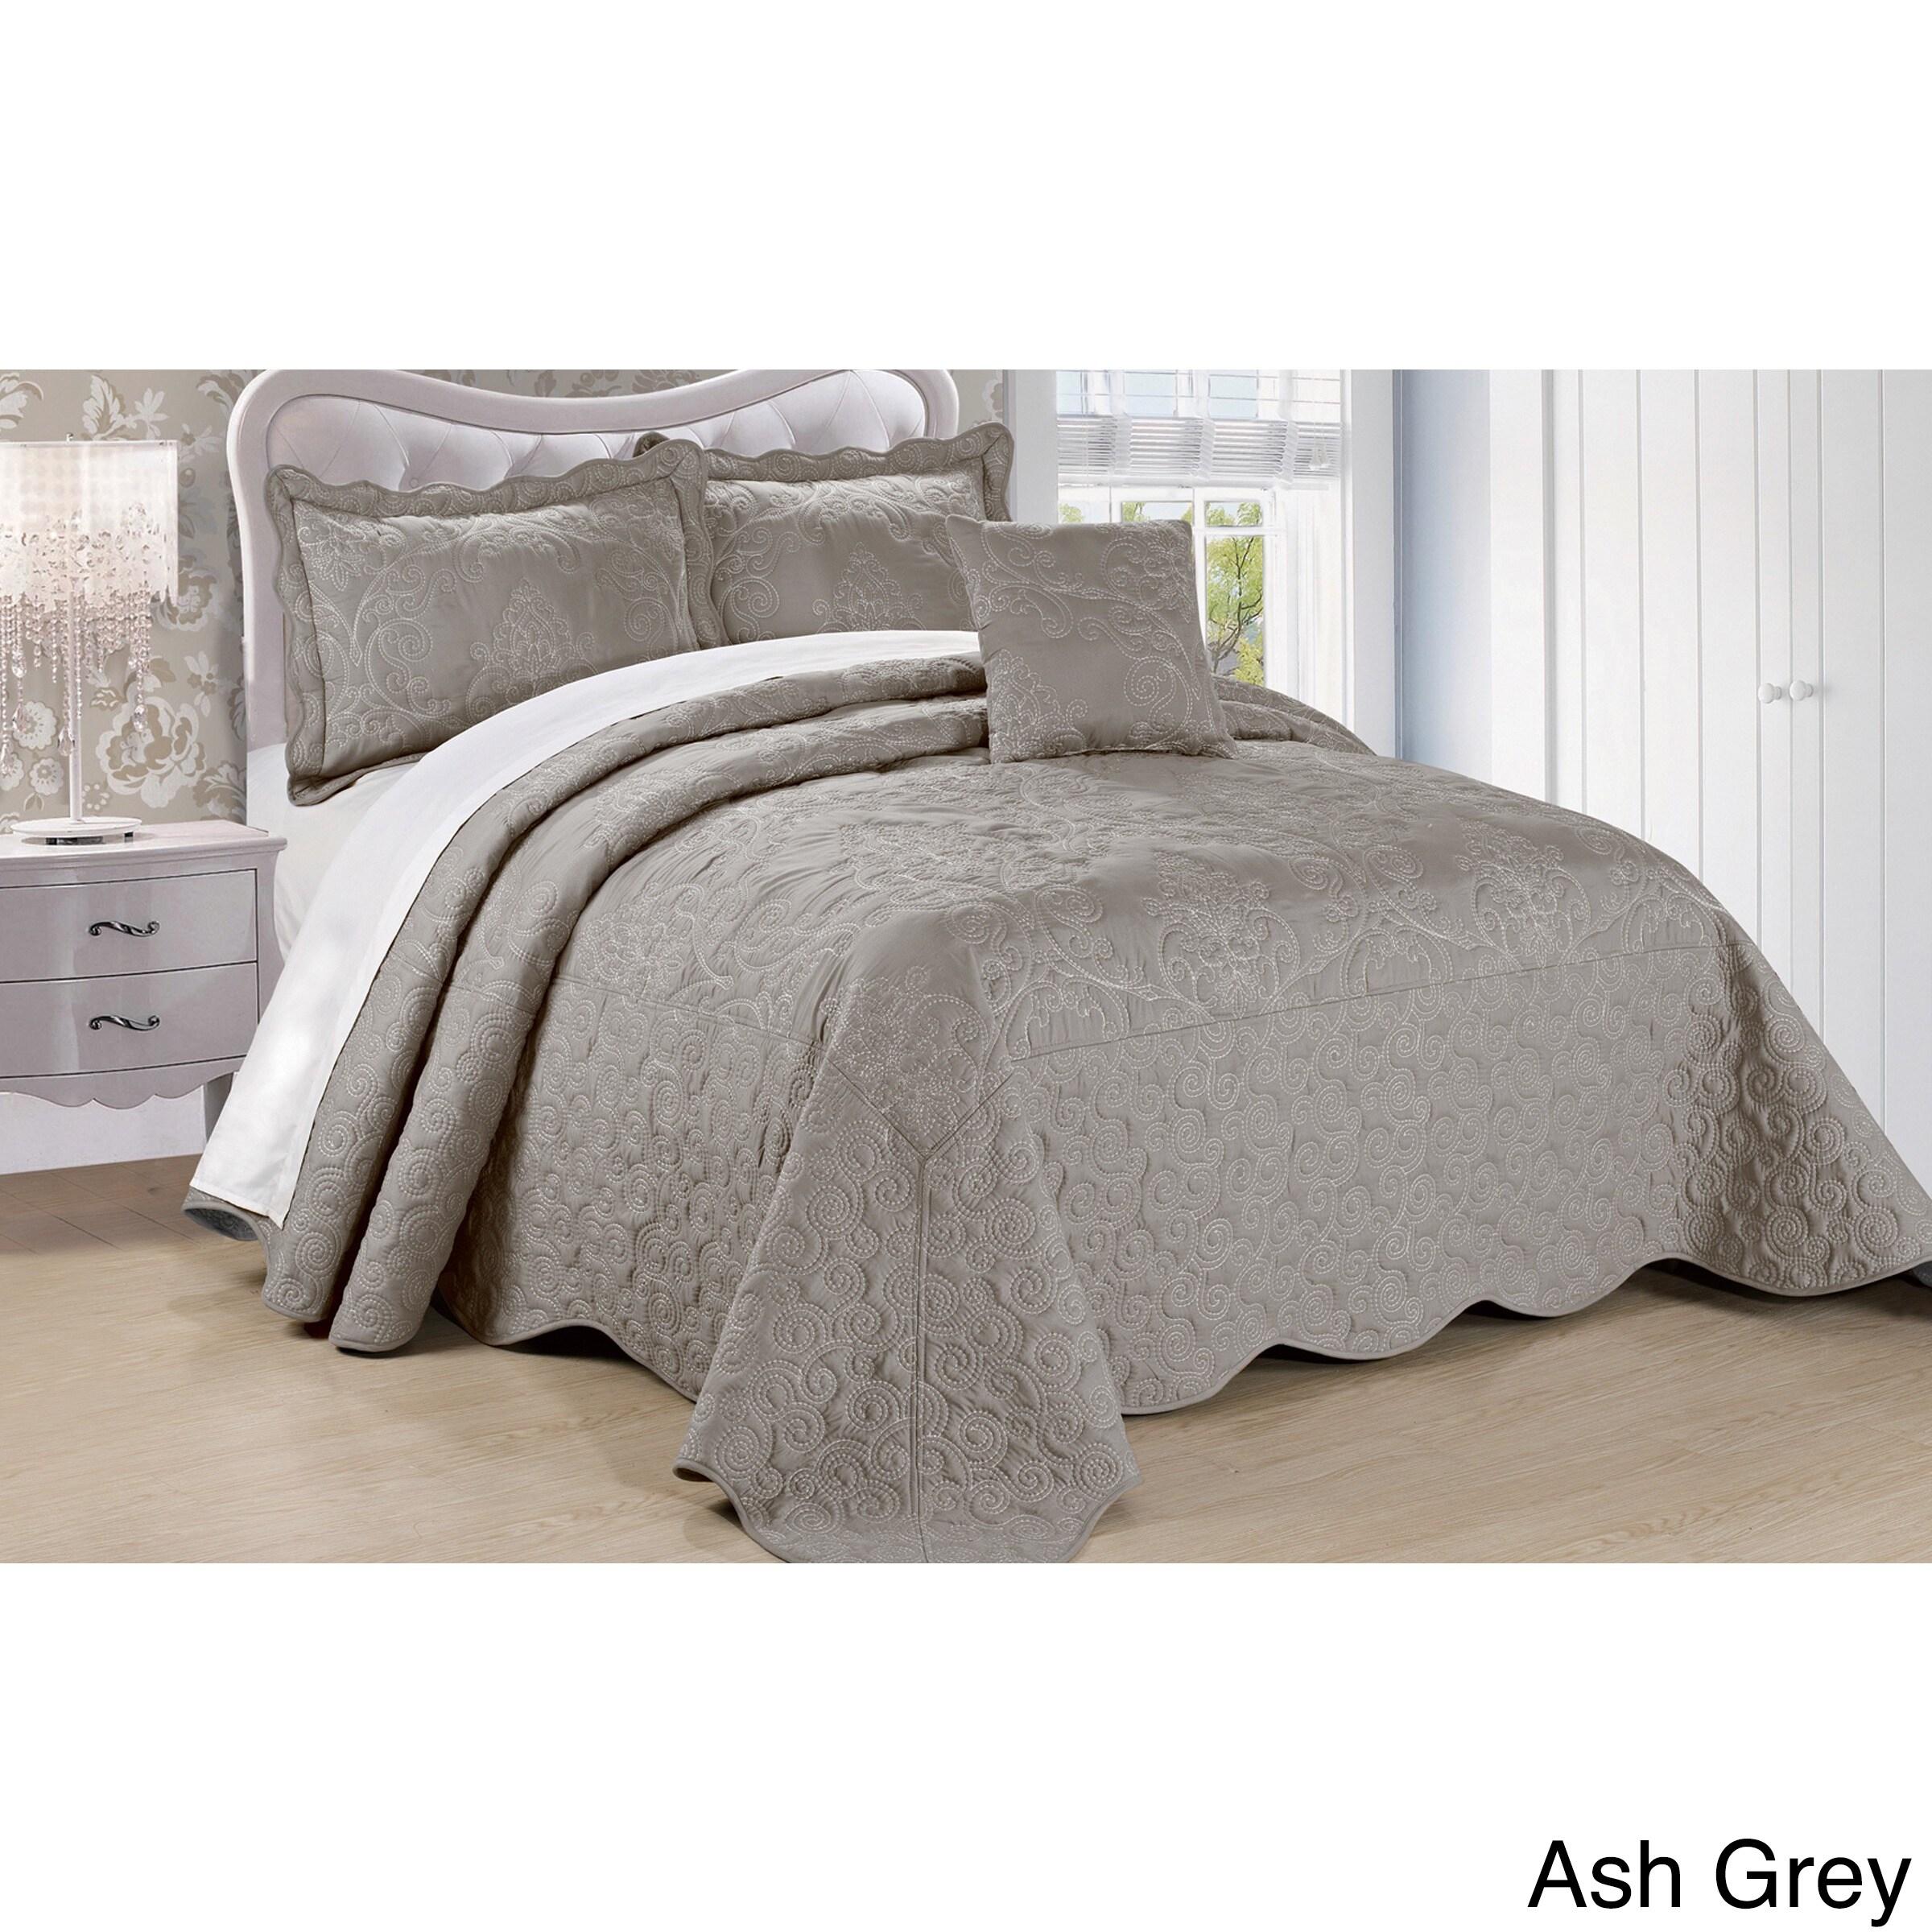 Shop Serenta Damask 4 Piece Bedspread Set   On Sale   Free Shipping Today    Overstock.com   11199151